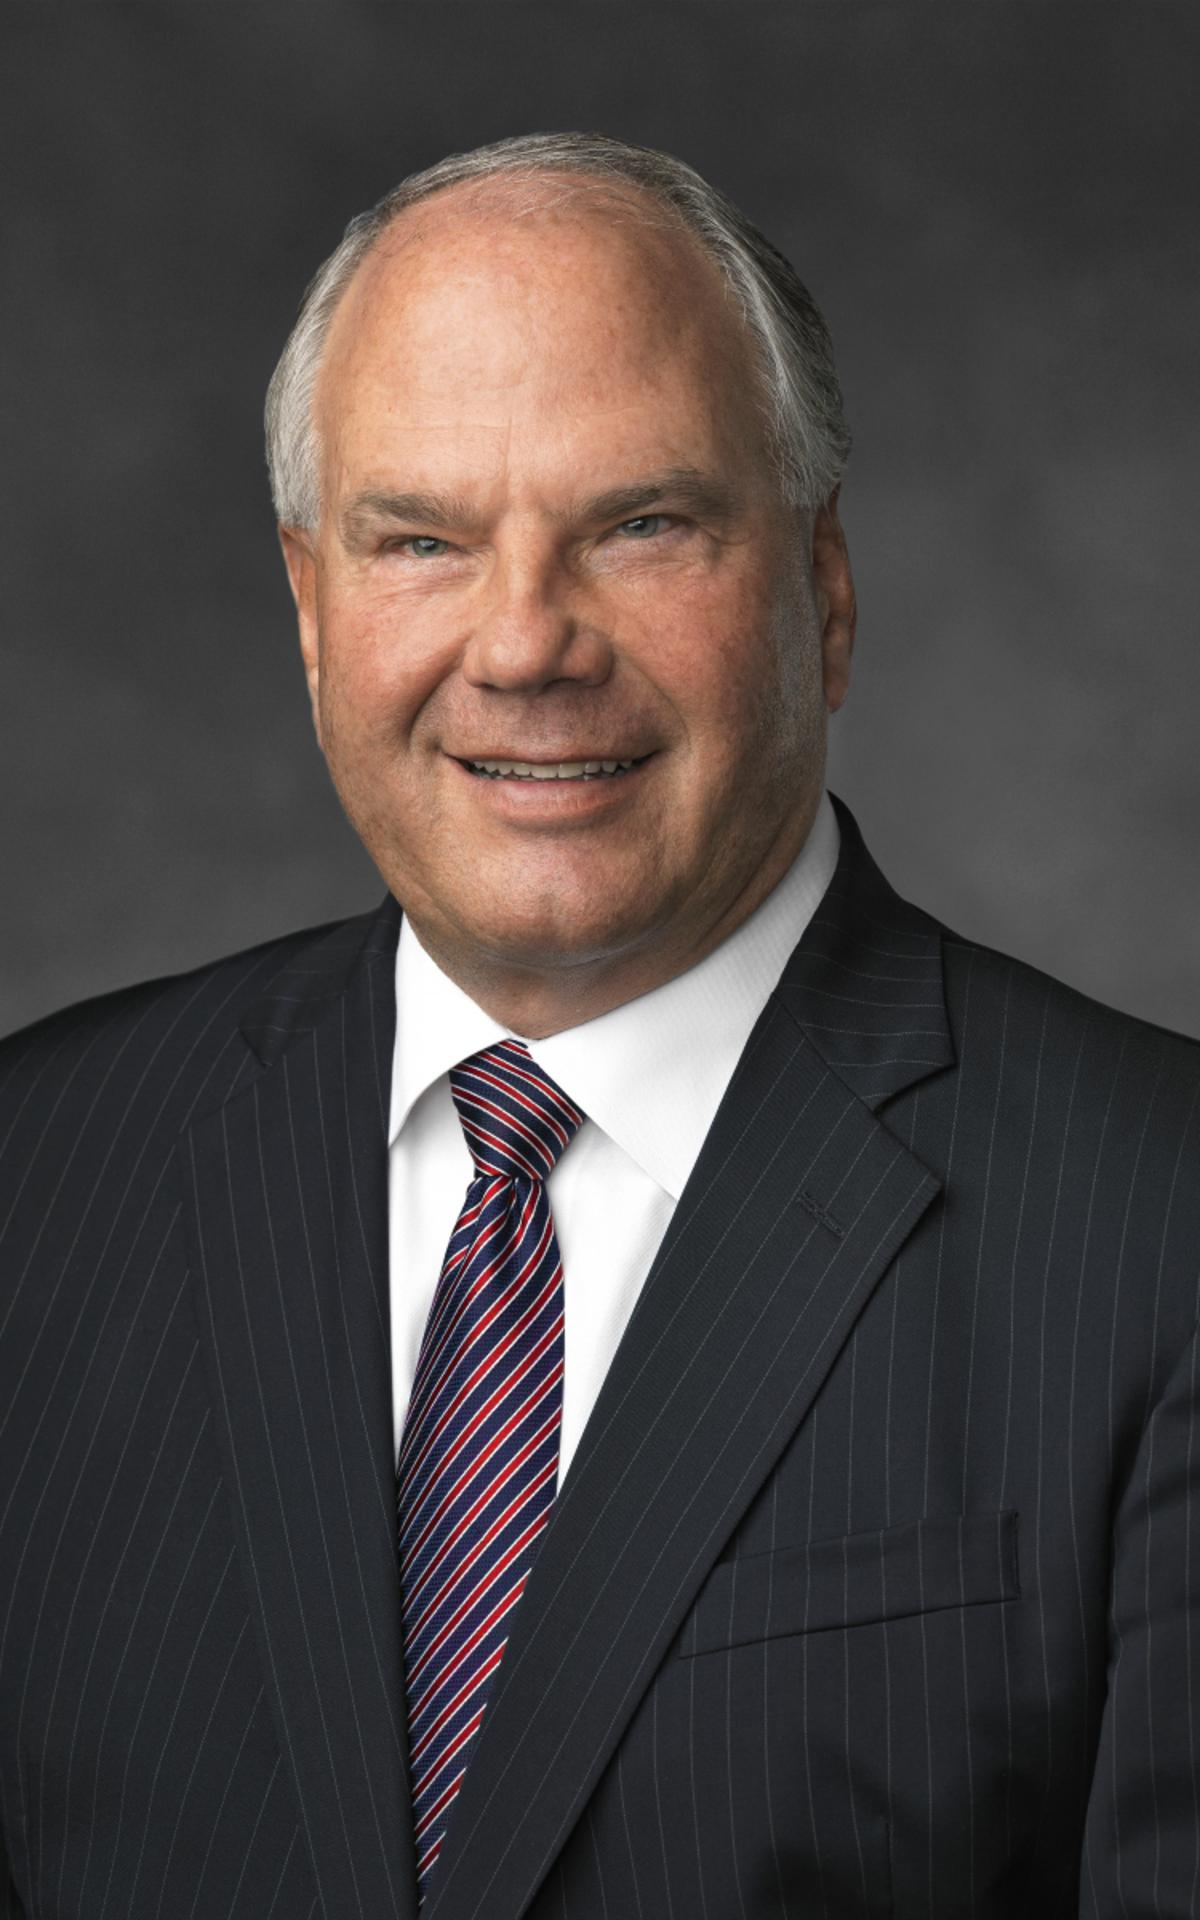 Ronald A. Rasband apostolo mormoni.jpg